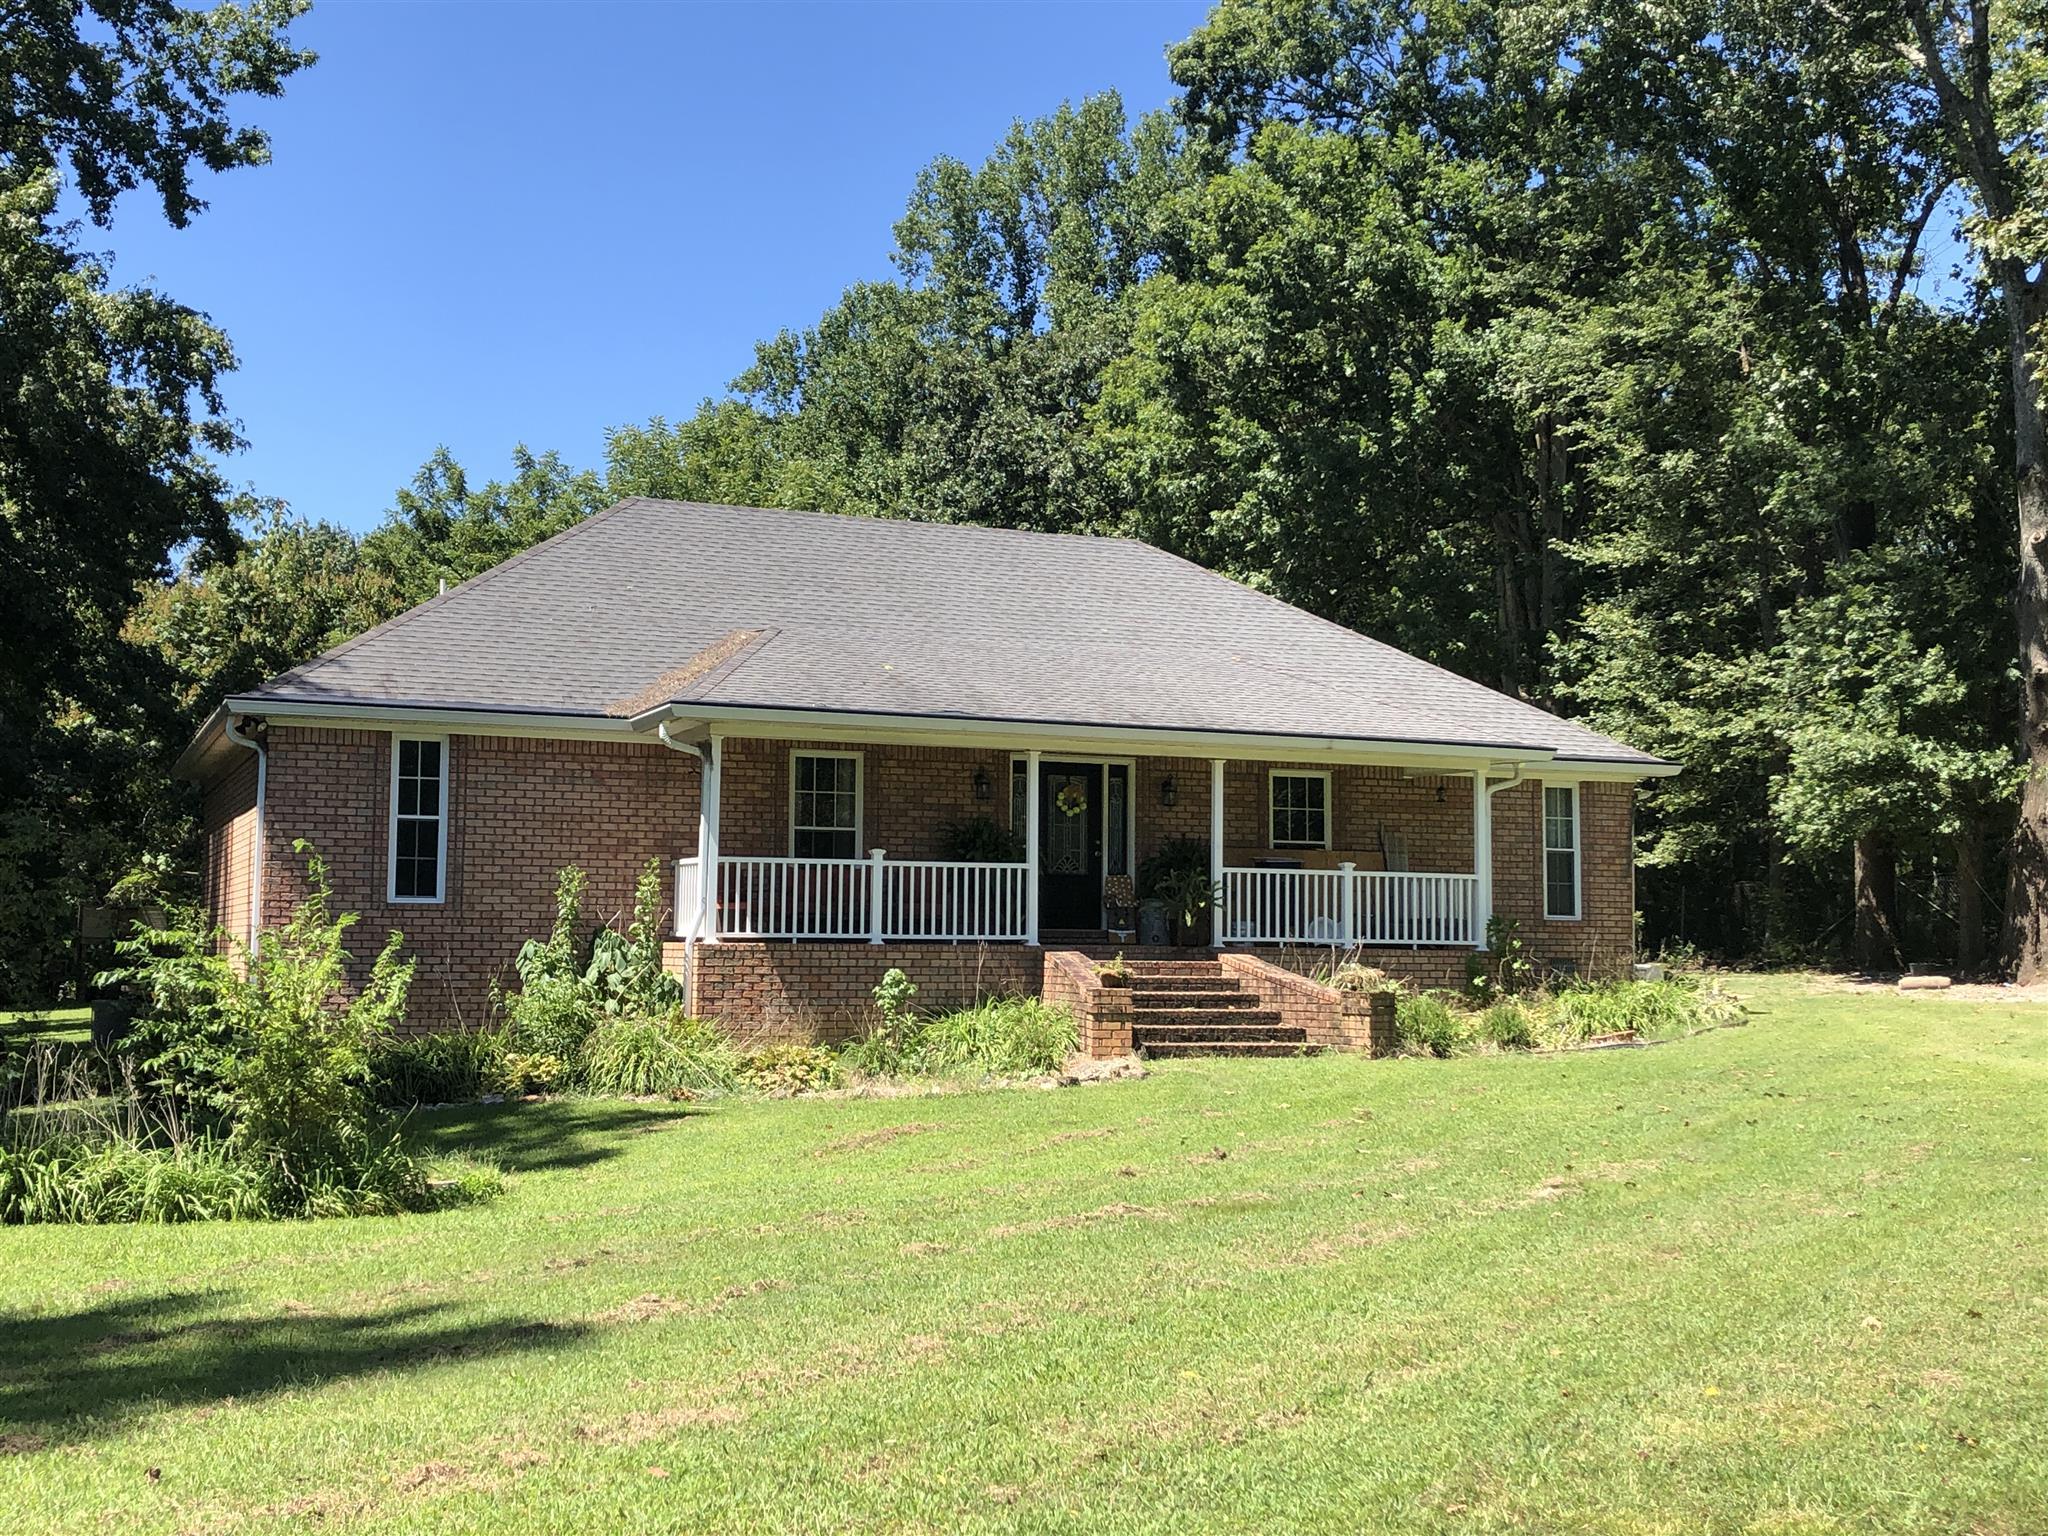 114 Park St, Ethridge, TN 38456 - Ethridge, TN real estate listing